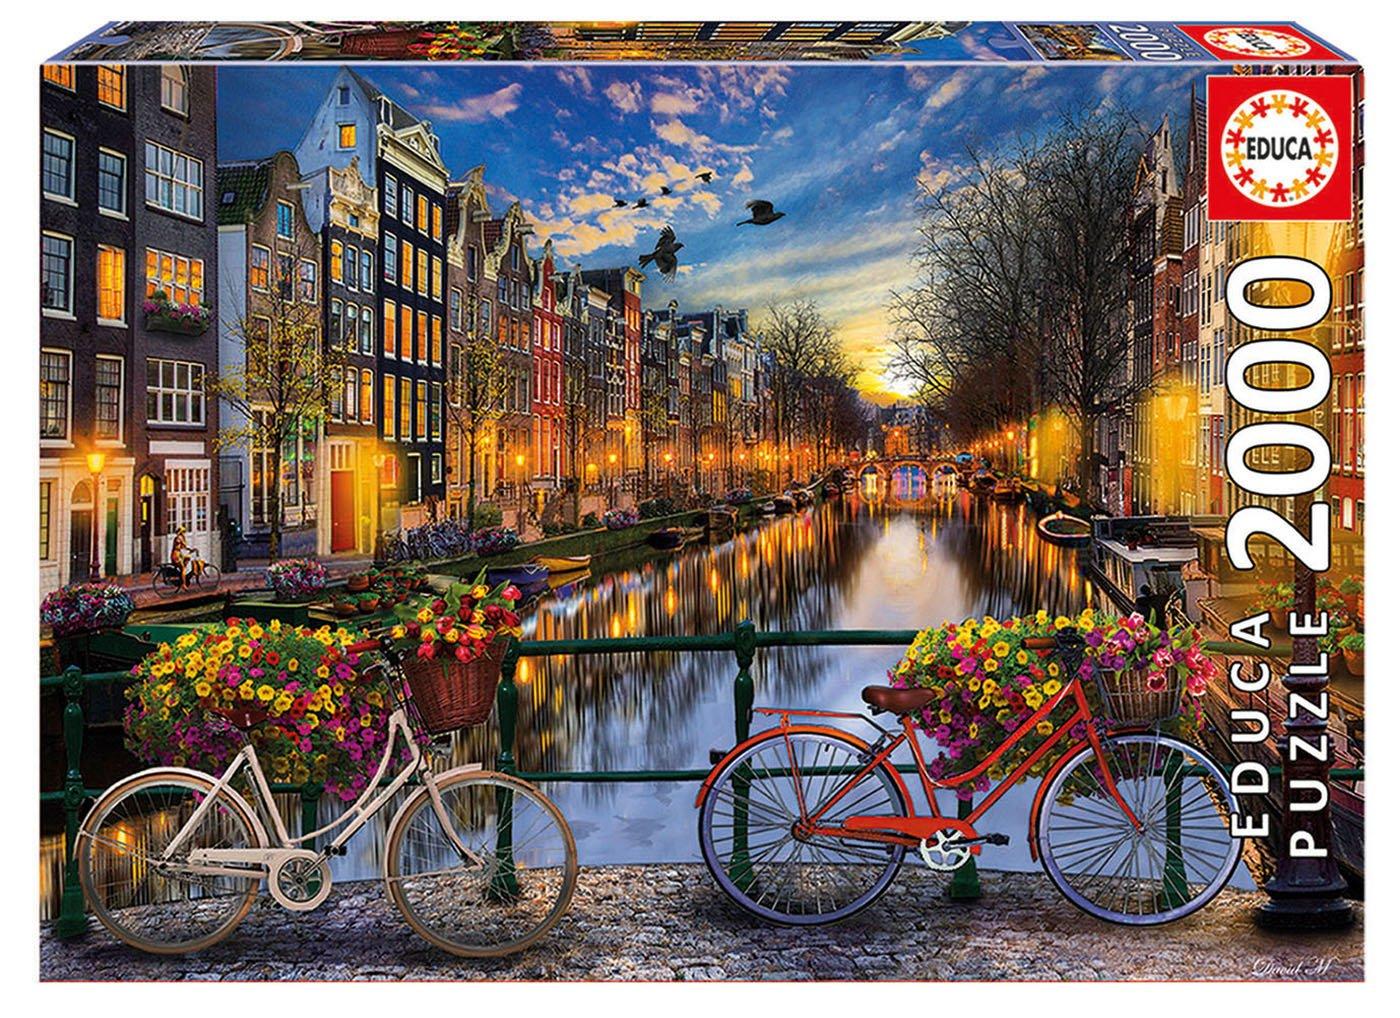 Educa Borrá s - 17127.0 - Puzzle -  Amsterdam - 2000  Piè ces